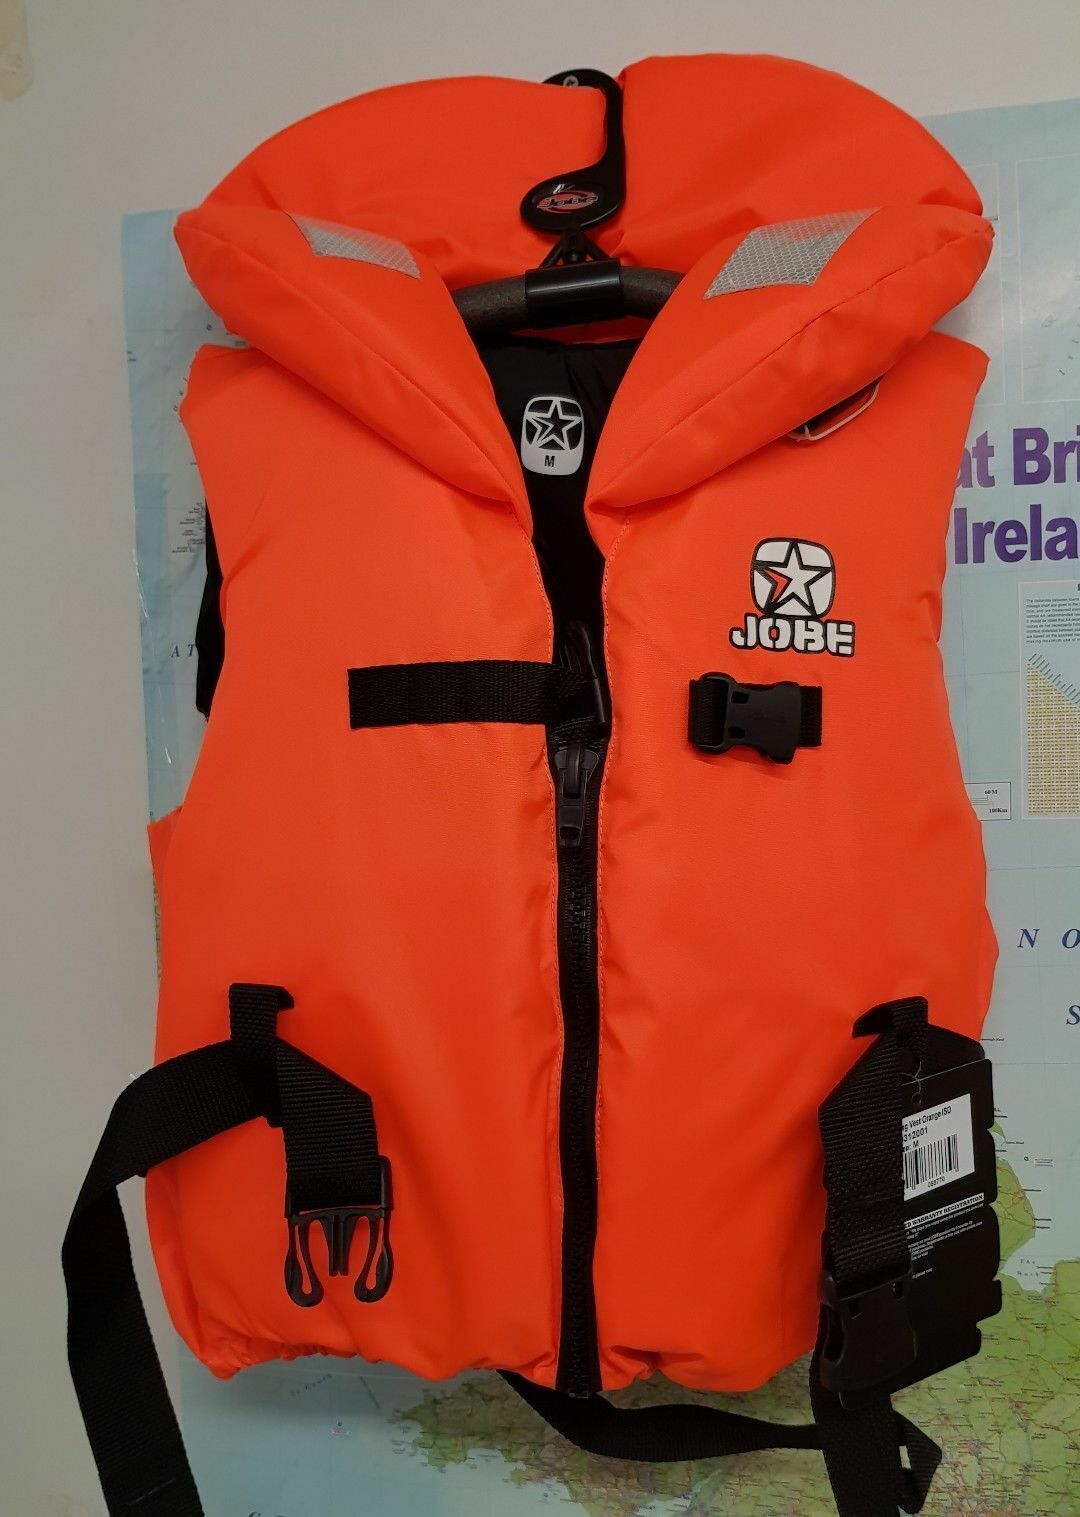 50N JOBE Outburst Vest size L   XL Kg 70+  Boating Kayak WaterSki Wakeboard